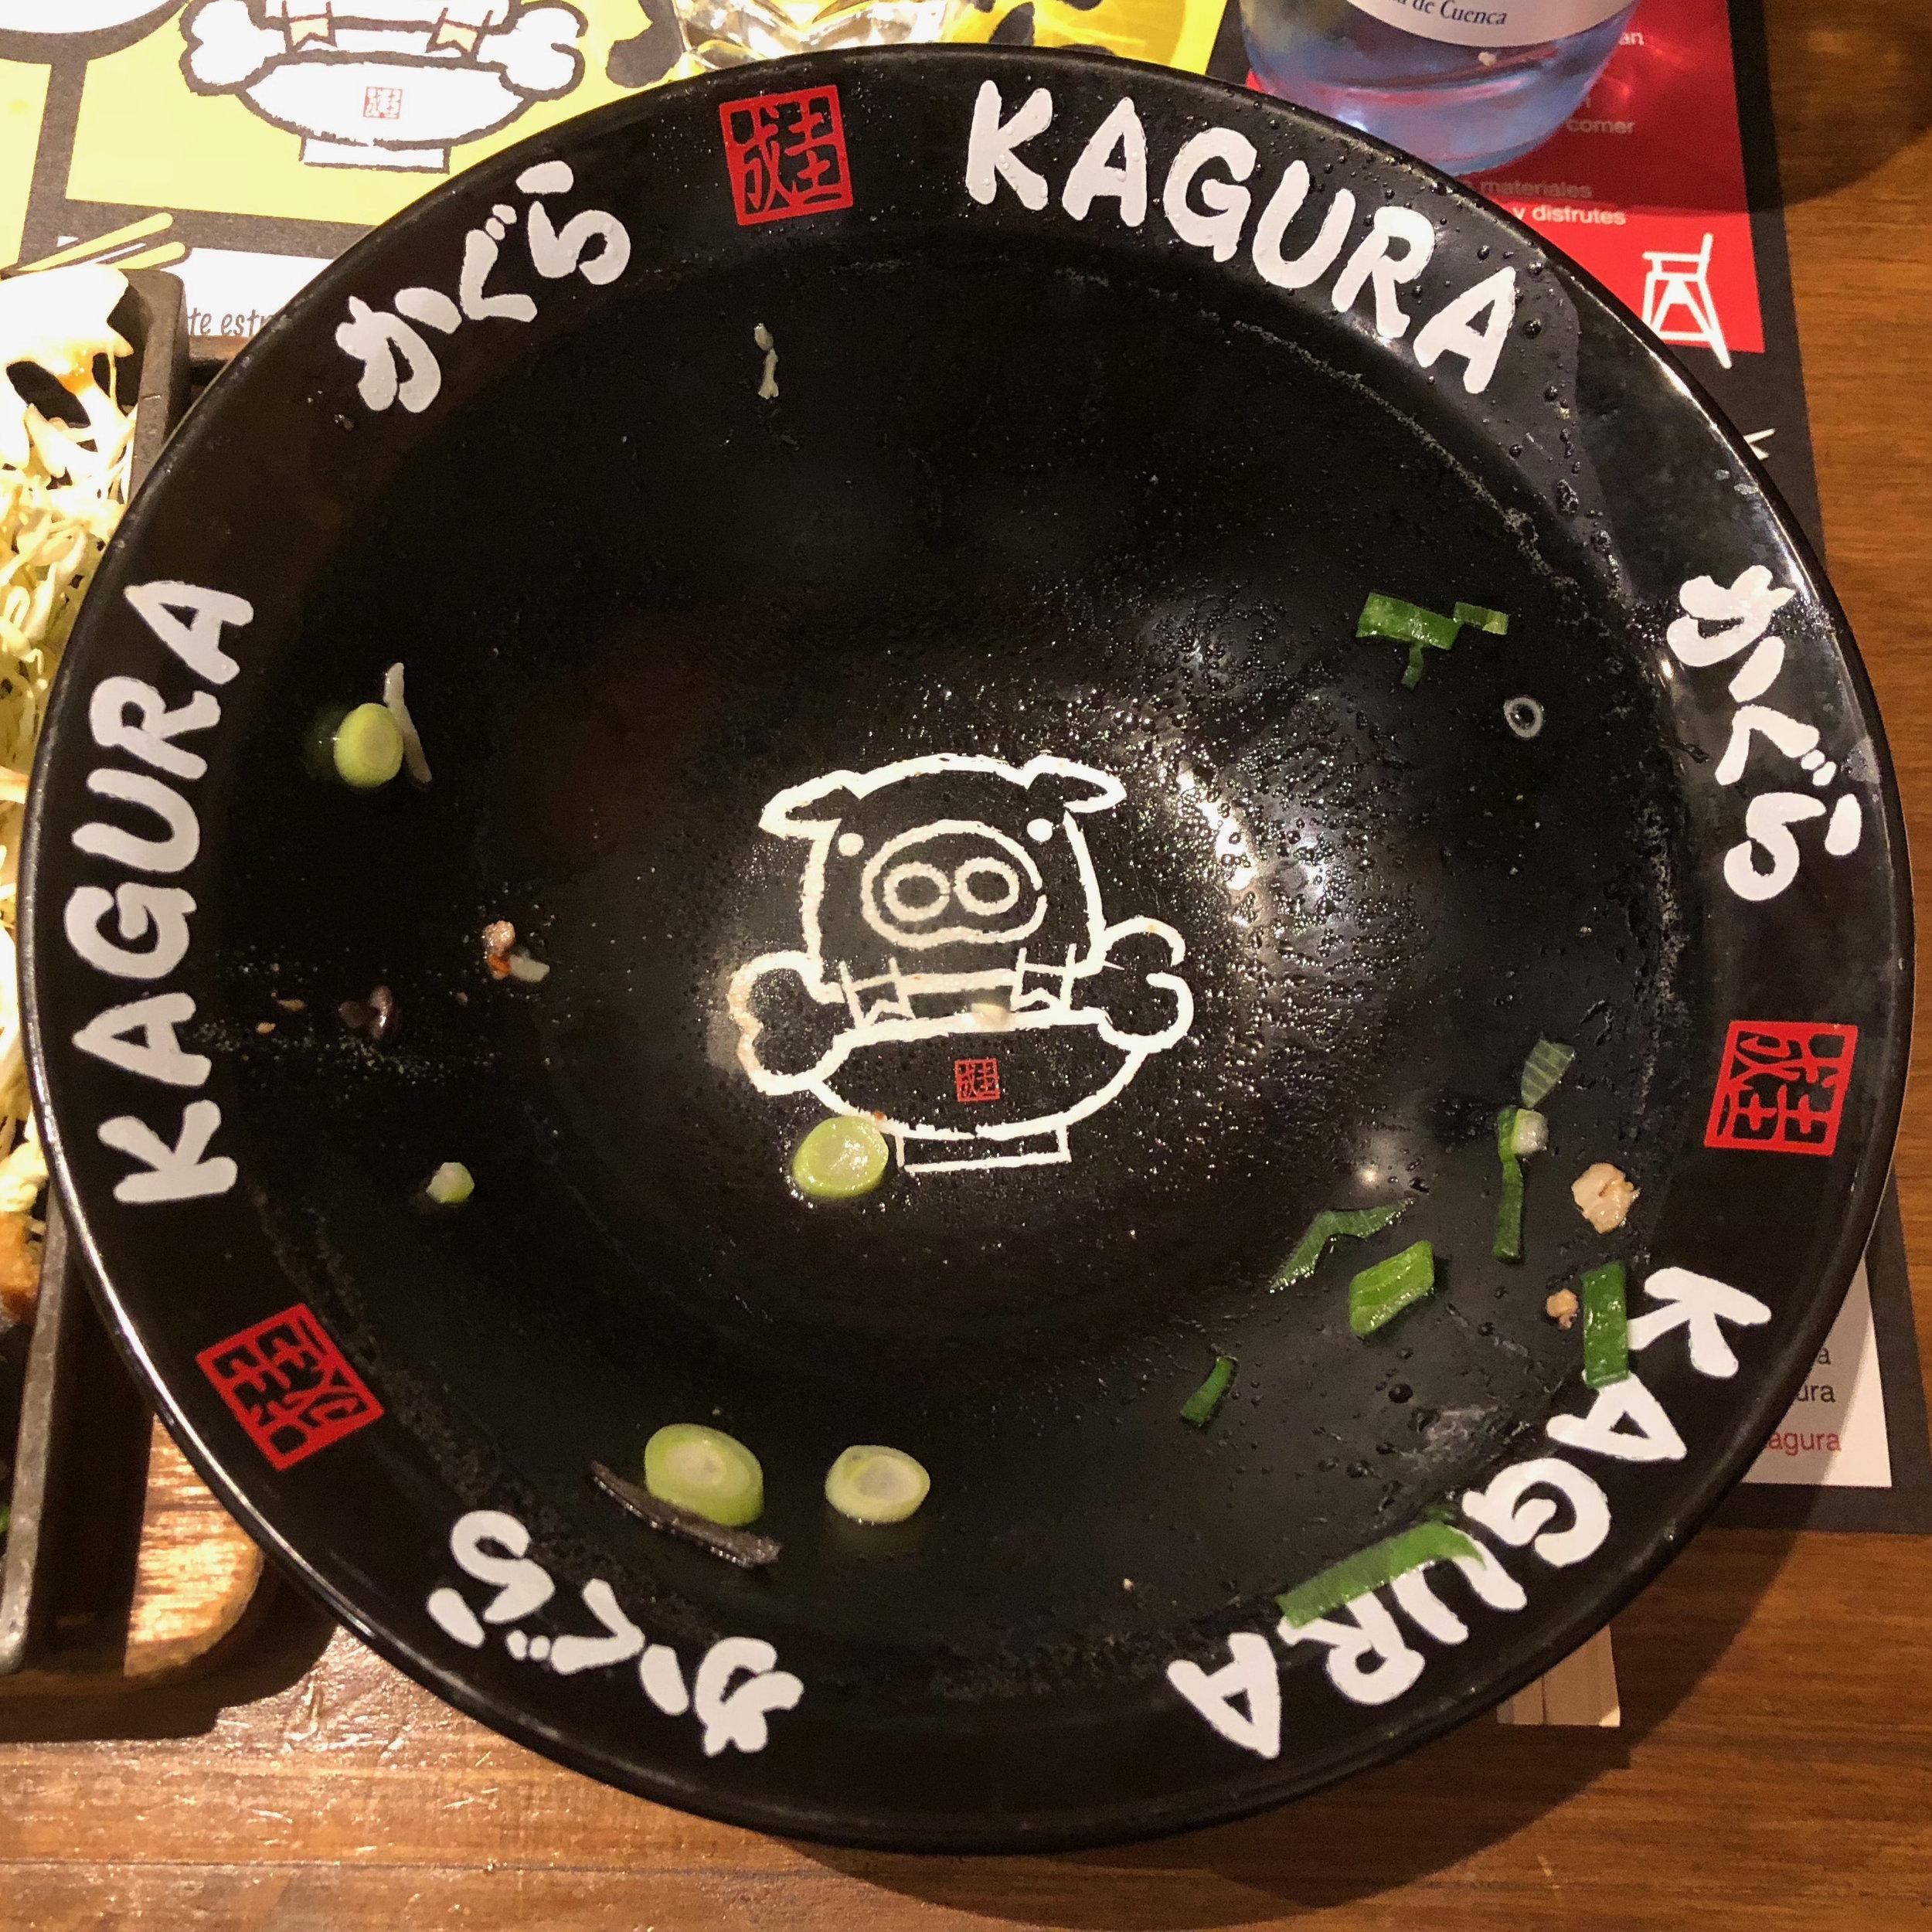 Kagura empty bowl